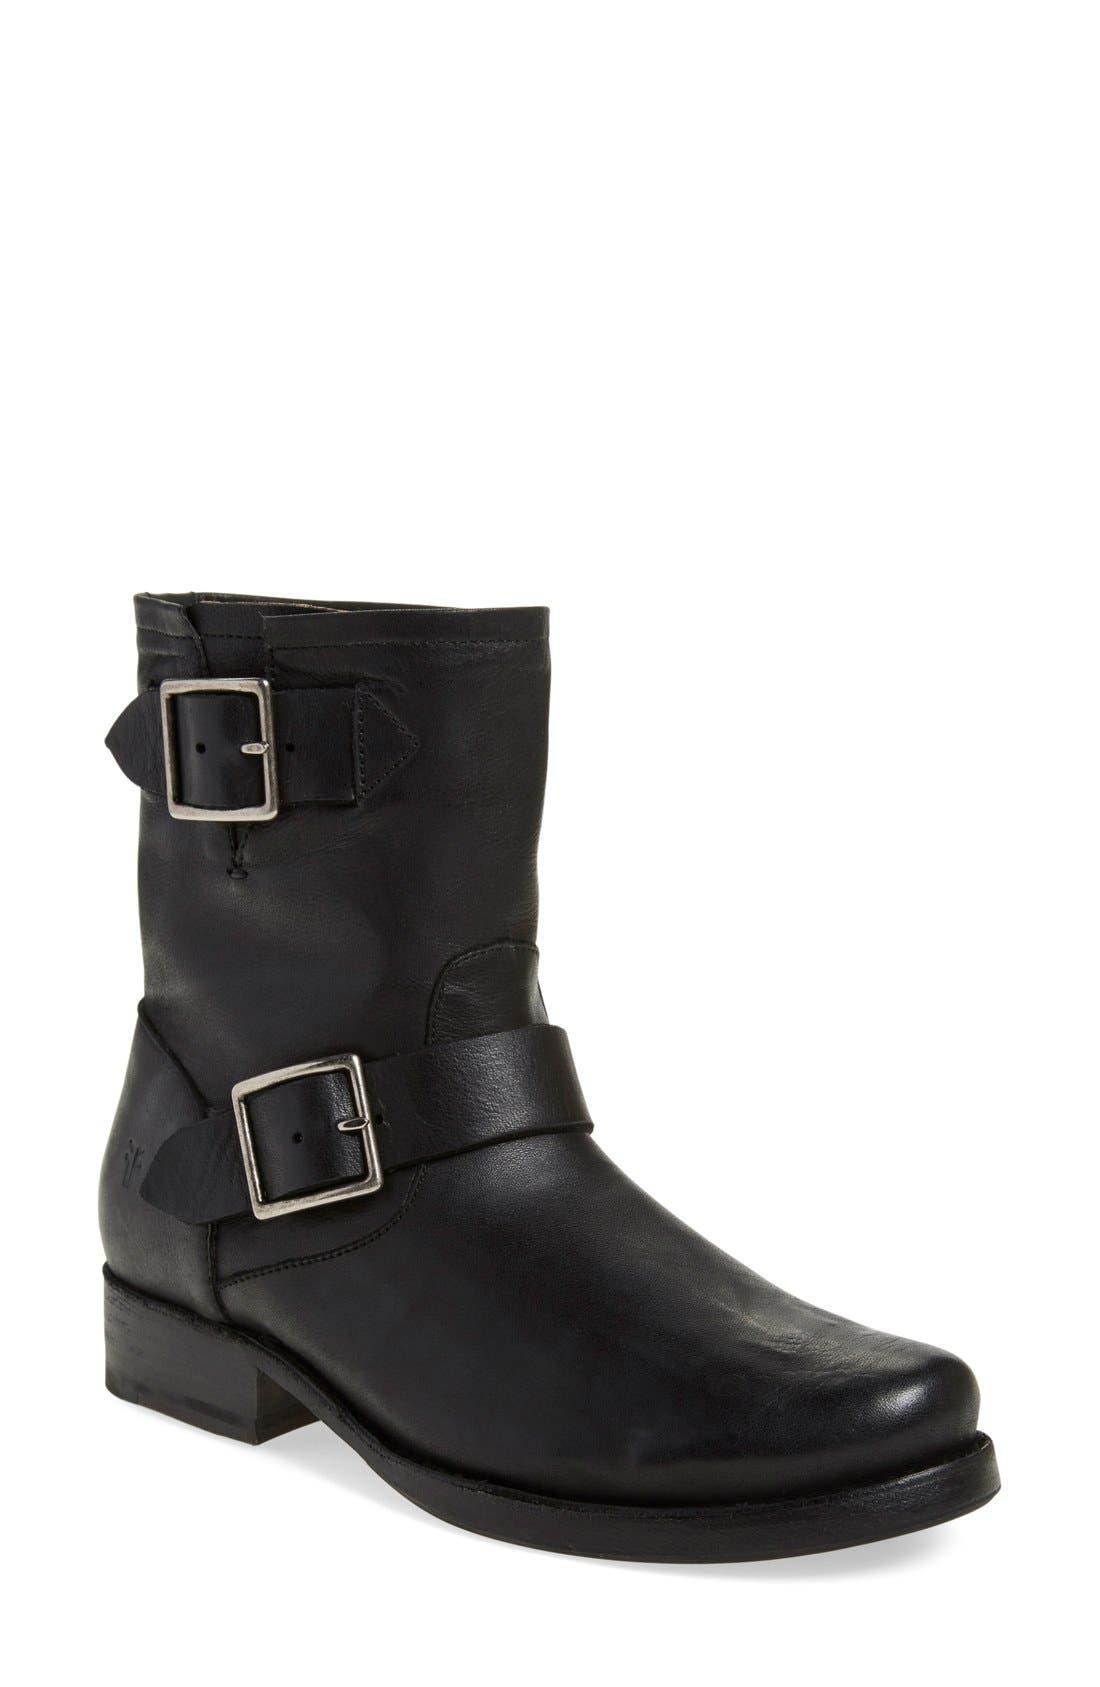 Alternate Image 1 Selected - Frye 'Vicky Engineer' Boot (Women)